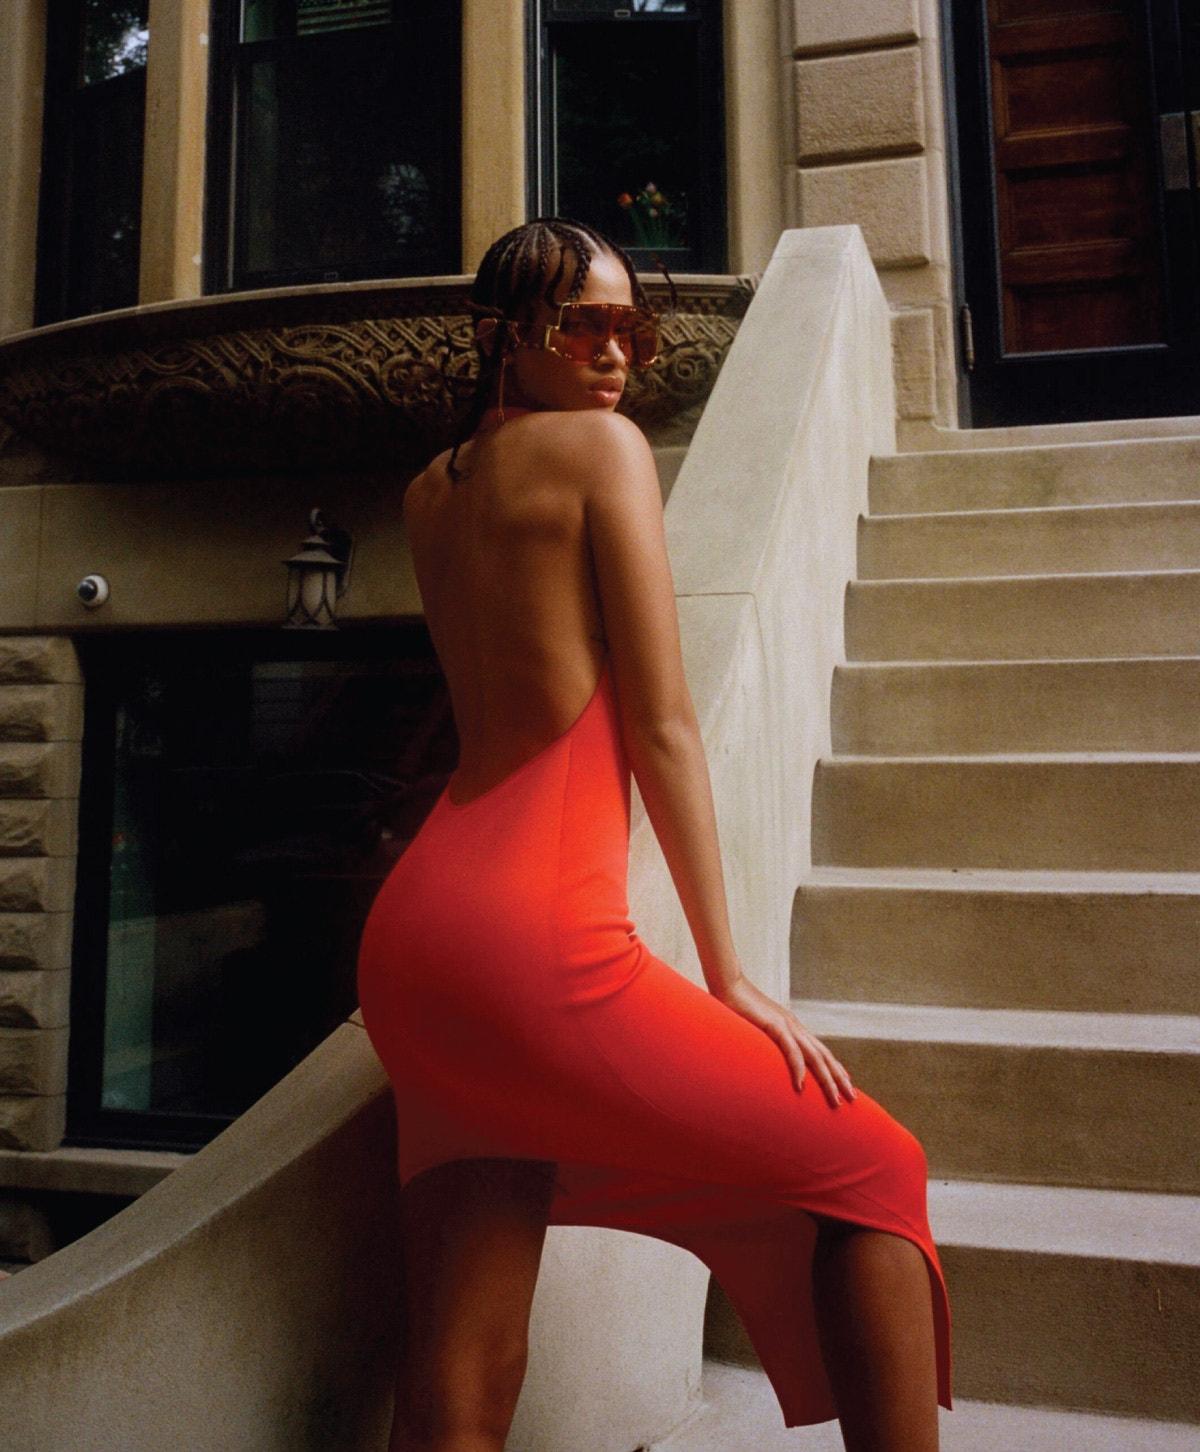 FENTY Blockt Mask Sunglasses in Terra Cotta – Long Knitted Dress in Orange – Rope in Rose-Tone Ear Cuffs Long in Peach